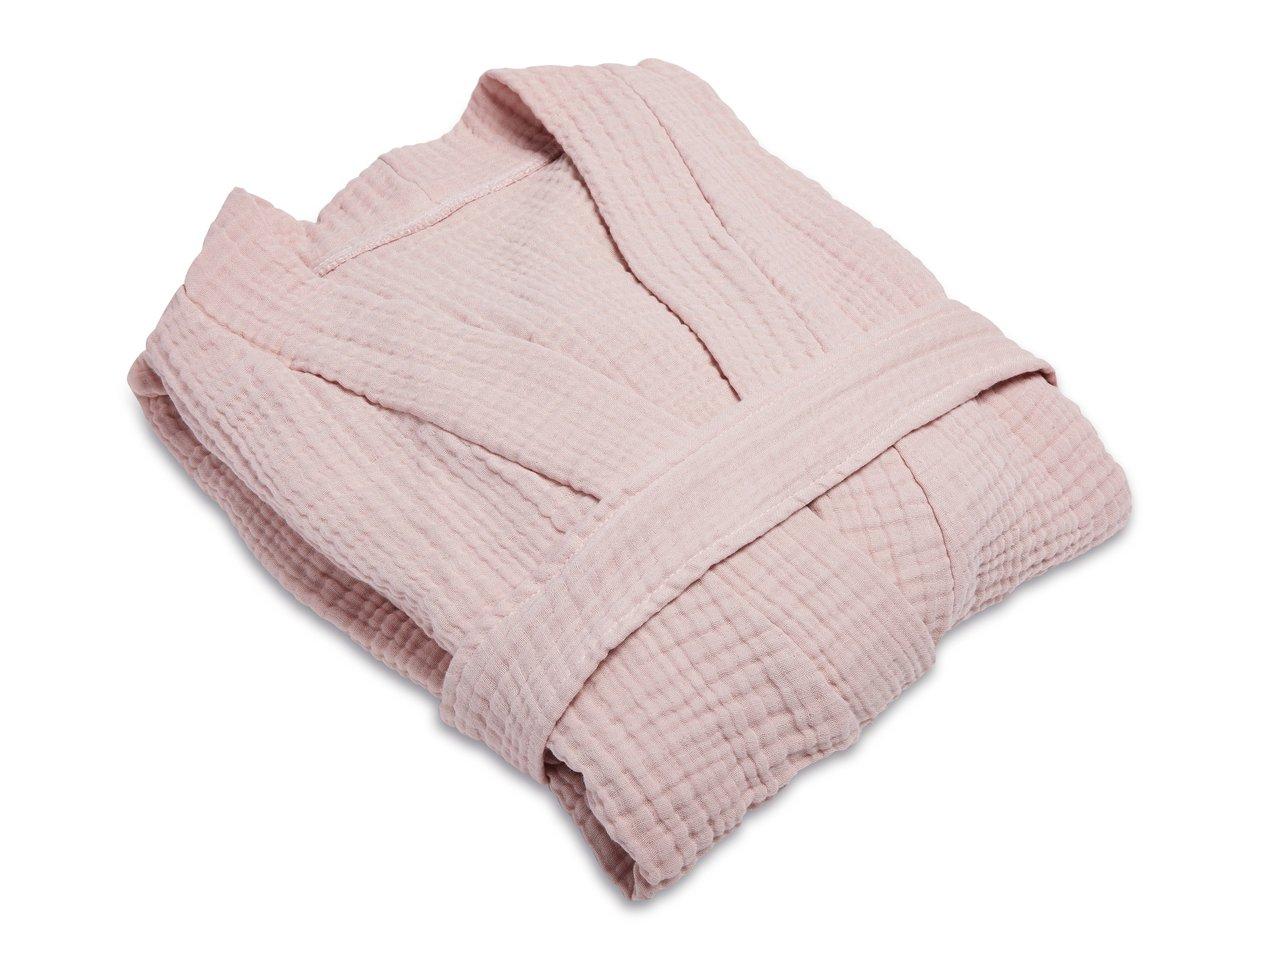 cloud-cotton-robe-blush-lp-000_1280x.jpg